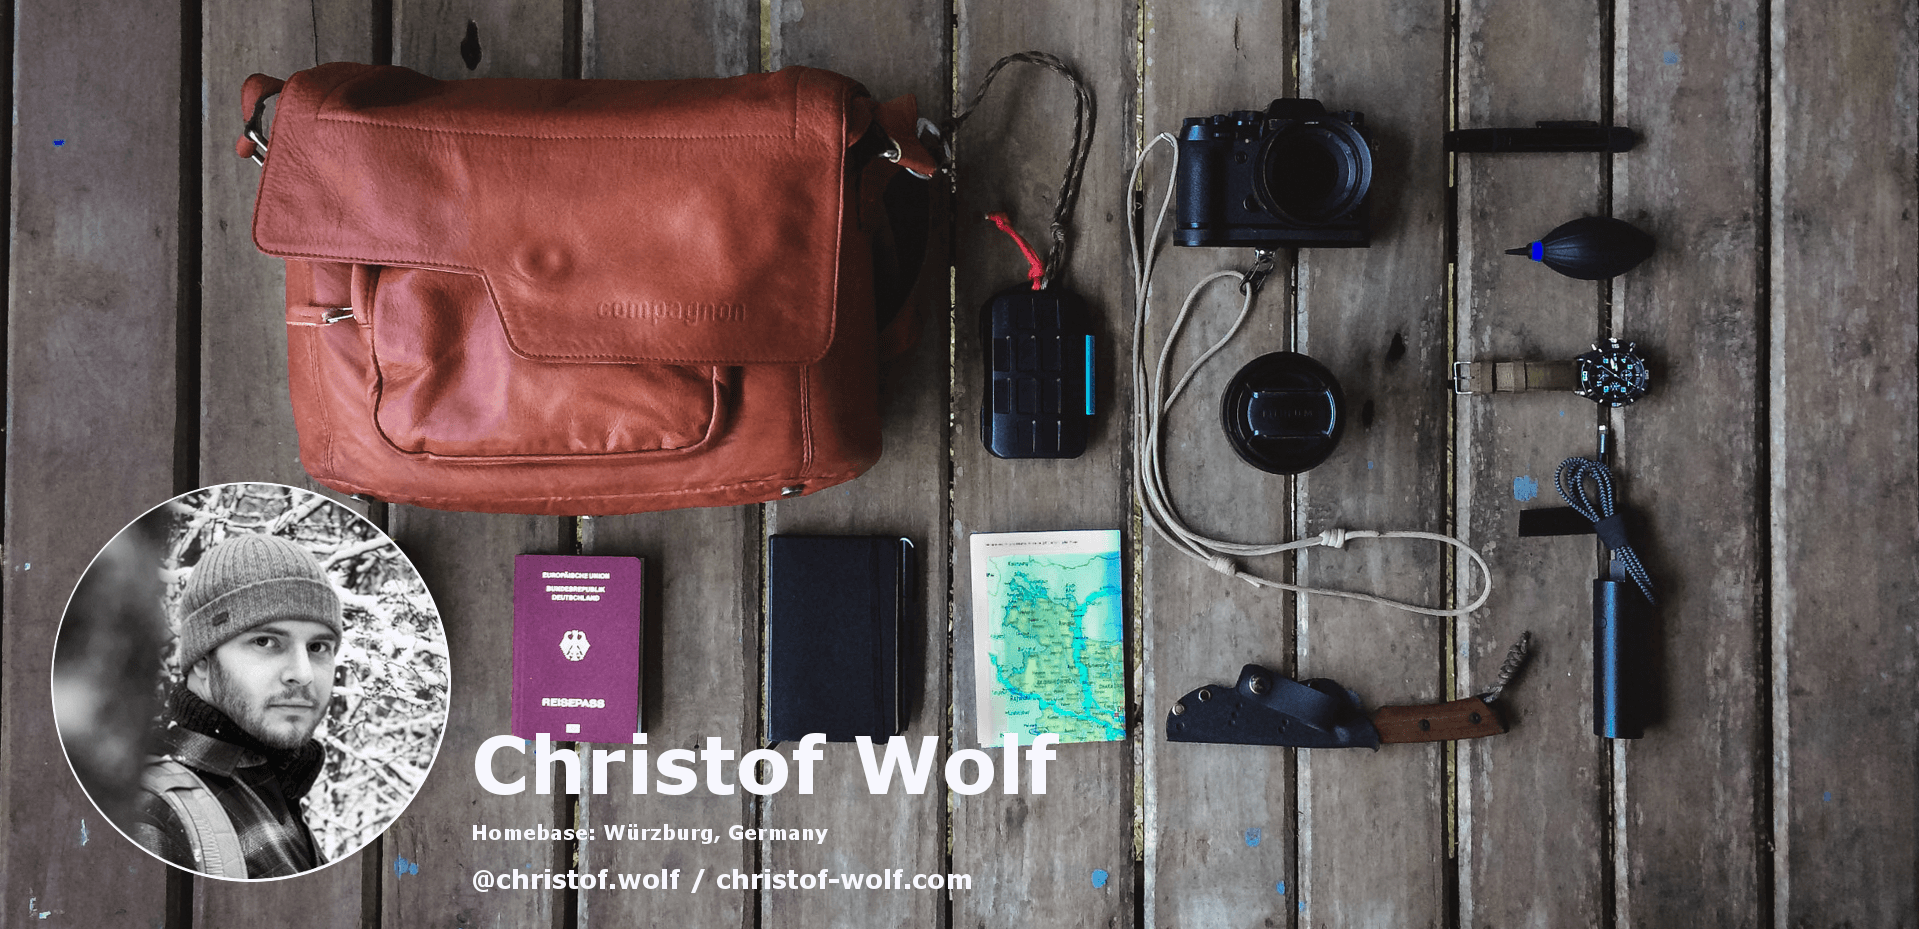 christof_wolf_ambassador_entry